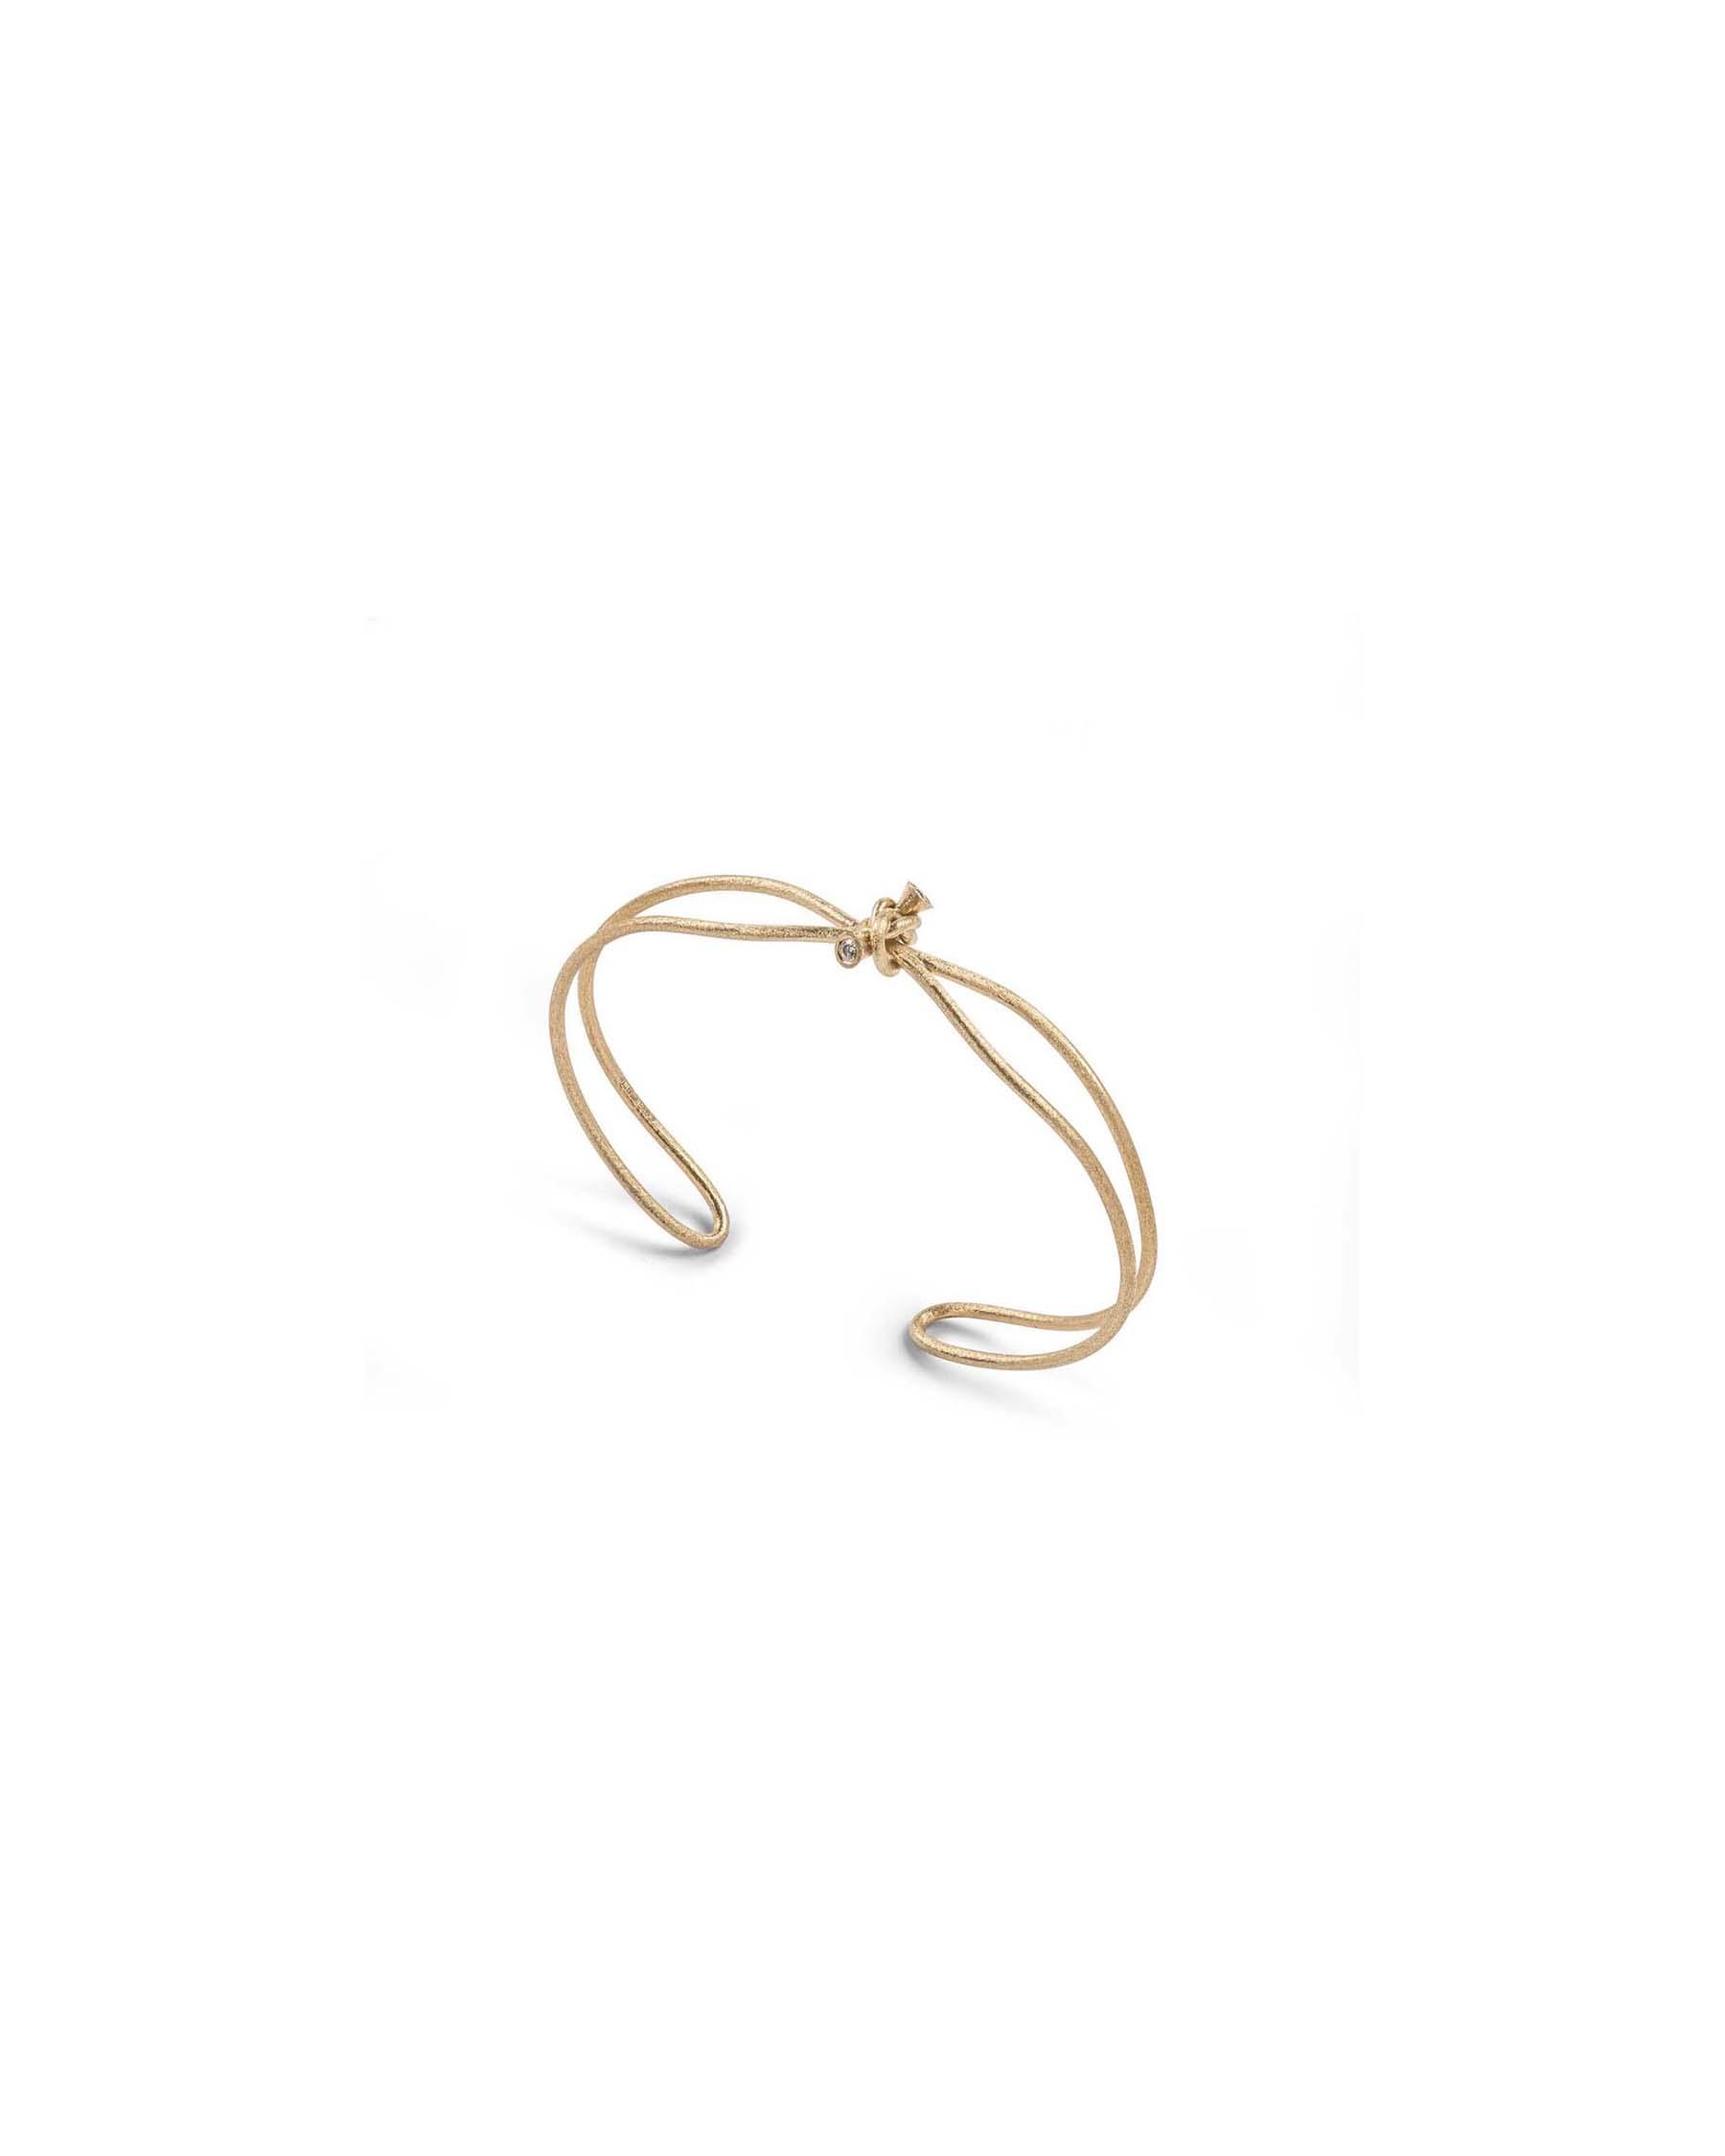 Gold simple knot bracelet